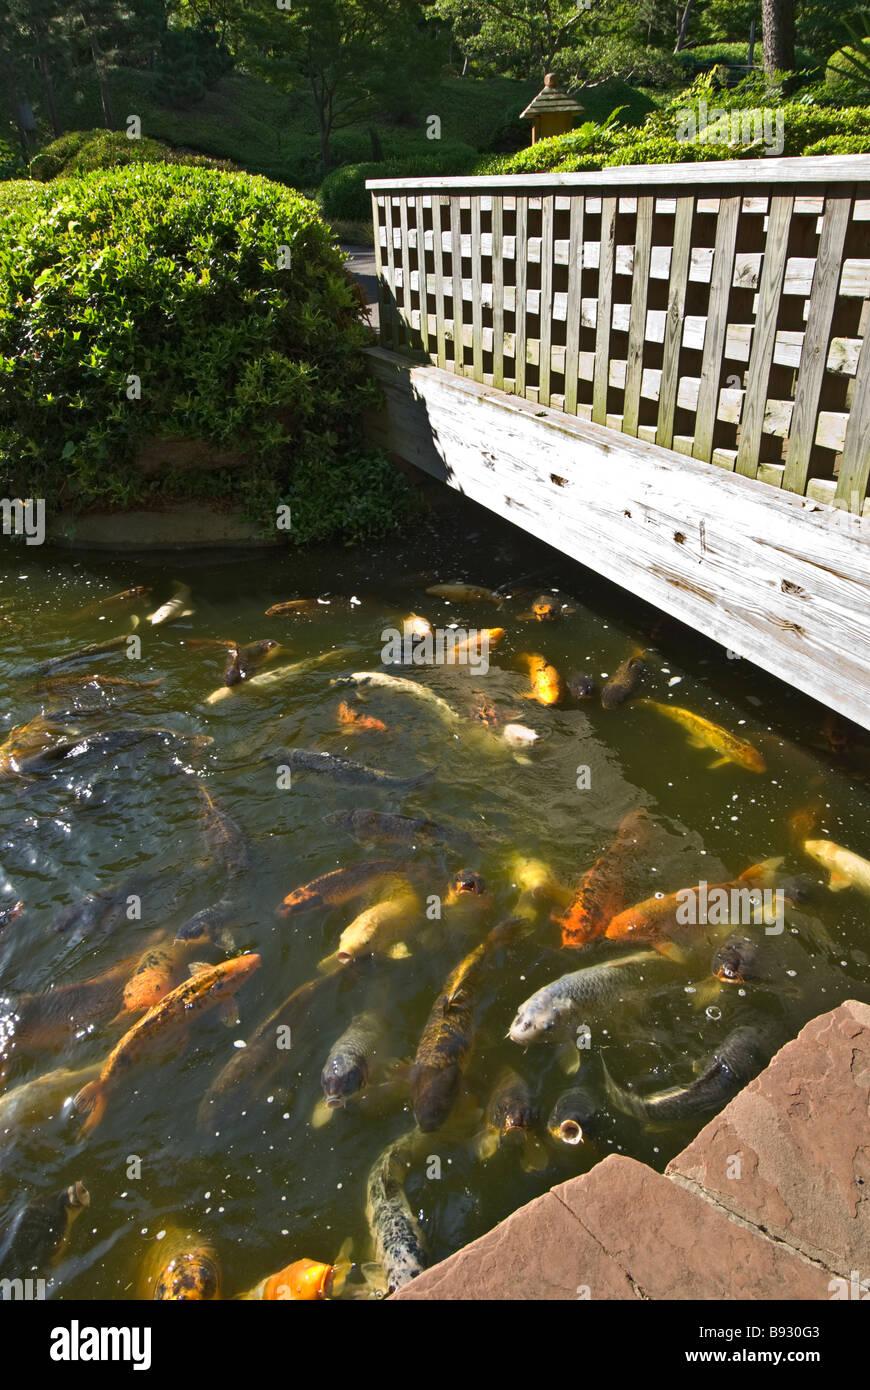 U S Botanic Garden Stock Photos & U S Botanic Garden Stock Images ...